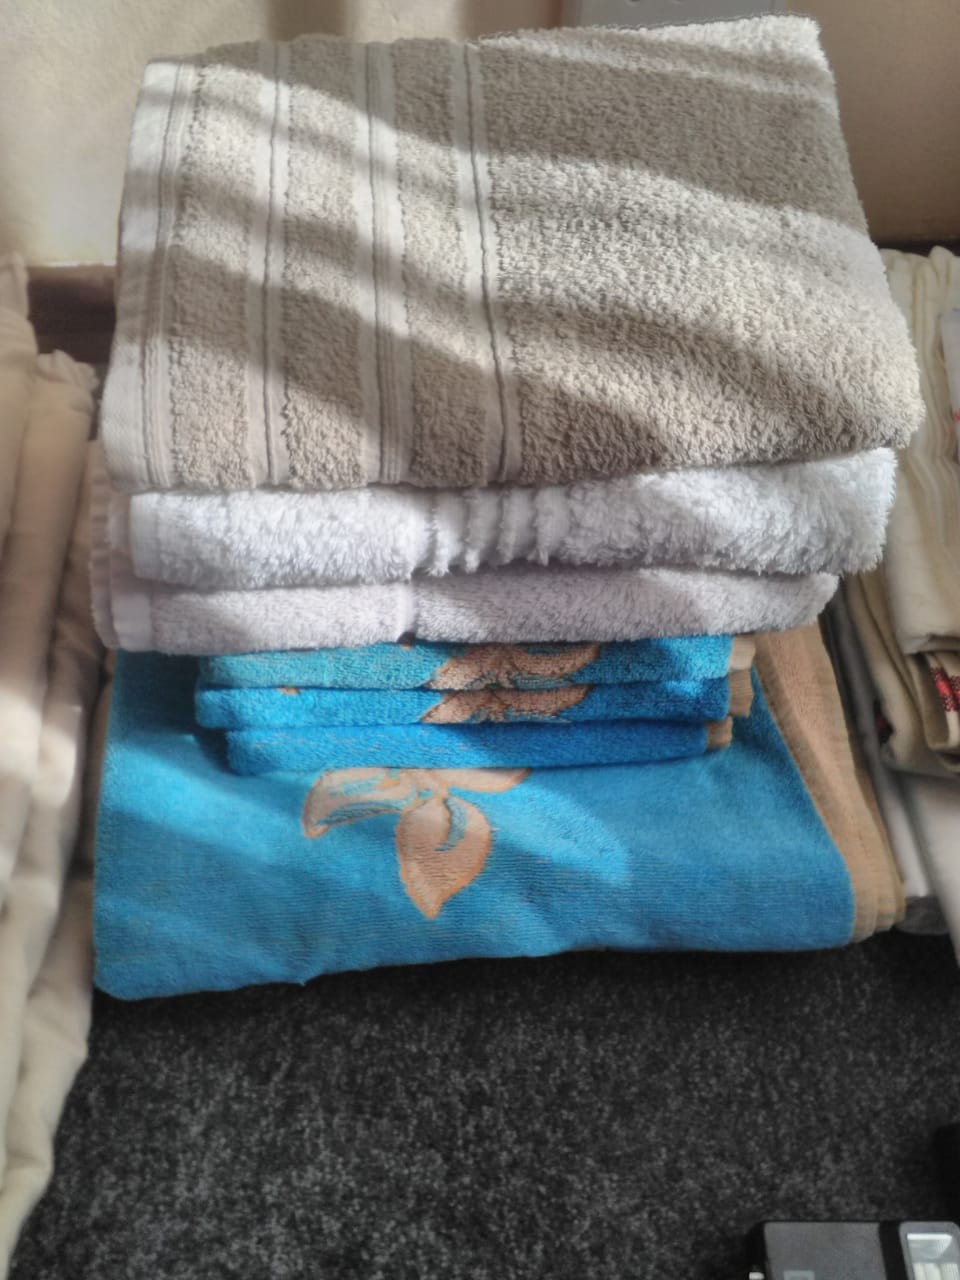 3 x bath towels